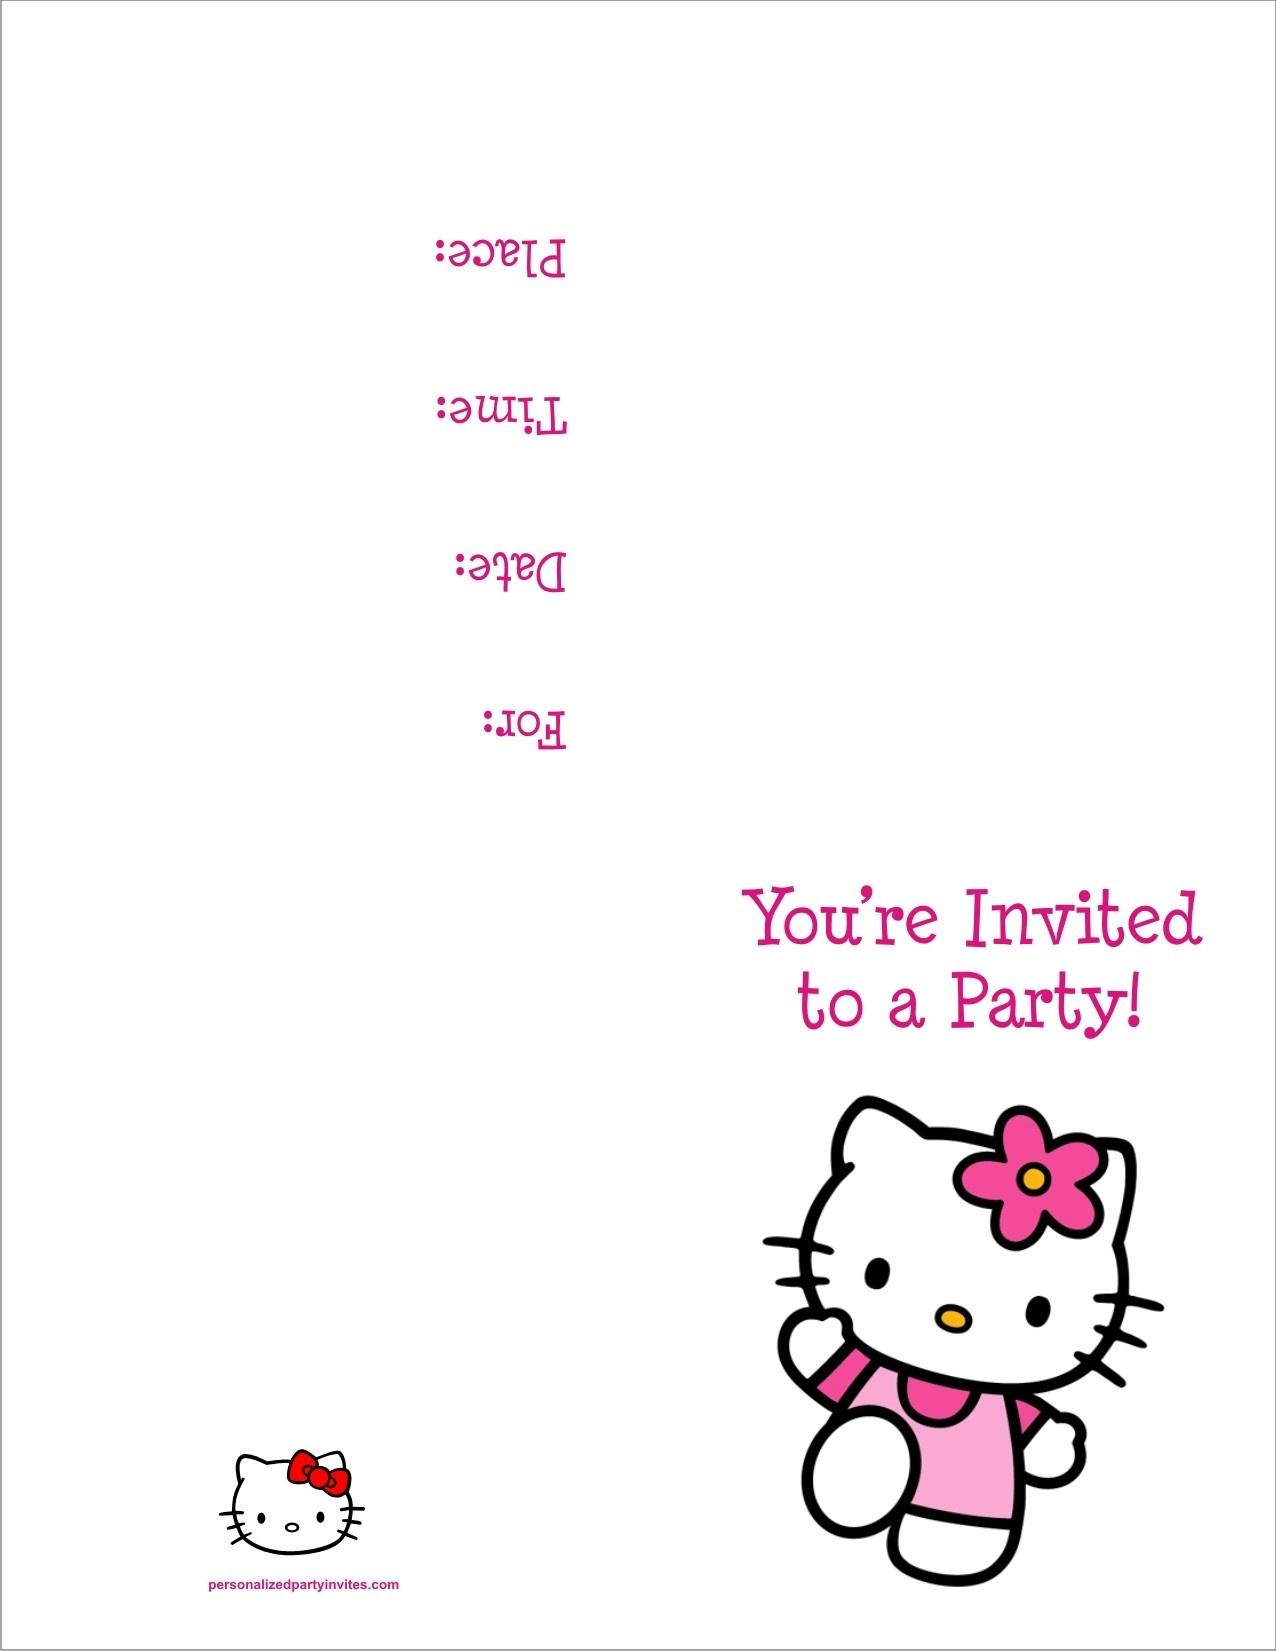 Hello Kitty Free Printable Birthday Party Invitation Personalized - Free Printable Personalized Birthday Invitation Cards